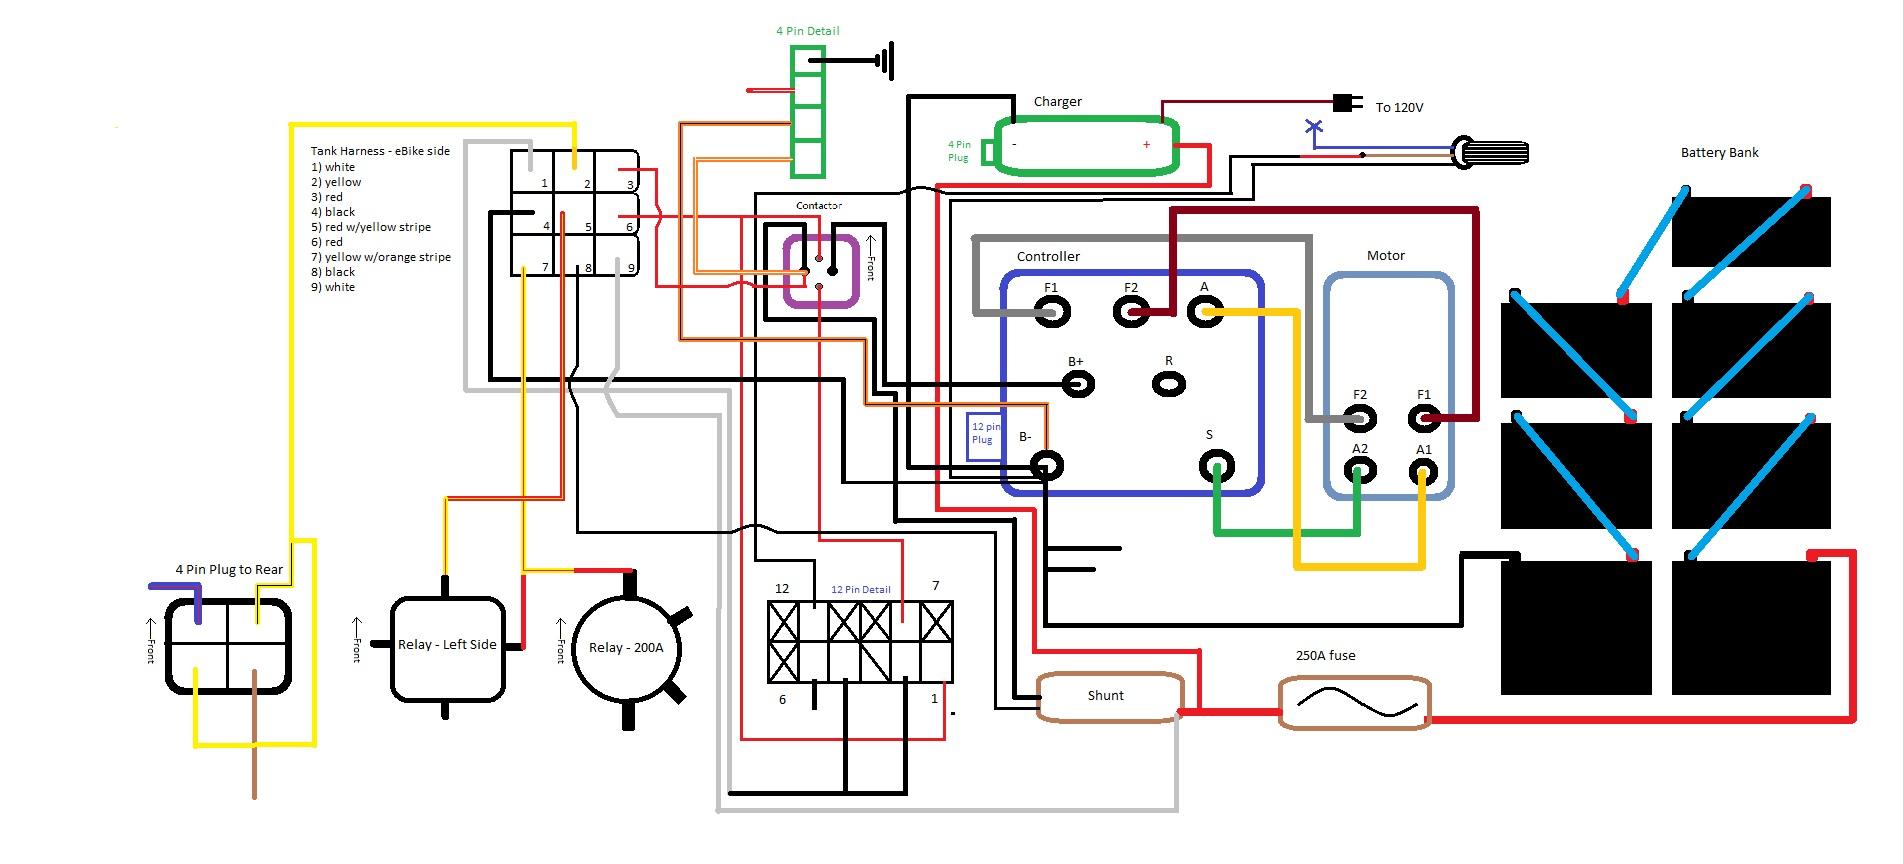 110 Razor Wiring Diagram Ebike Wiring Diagram V2 College Project Ebikes